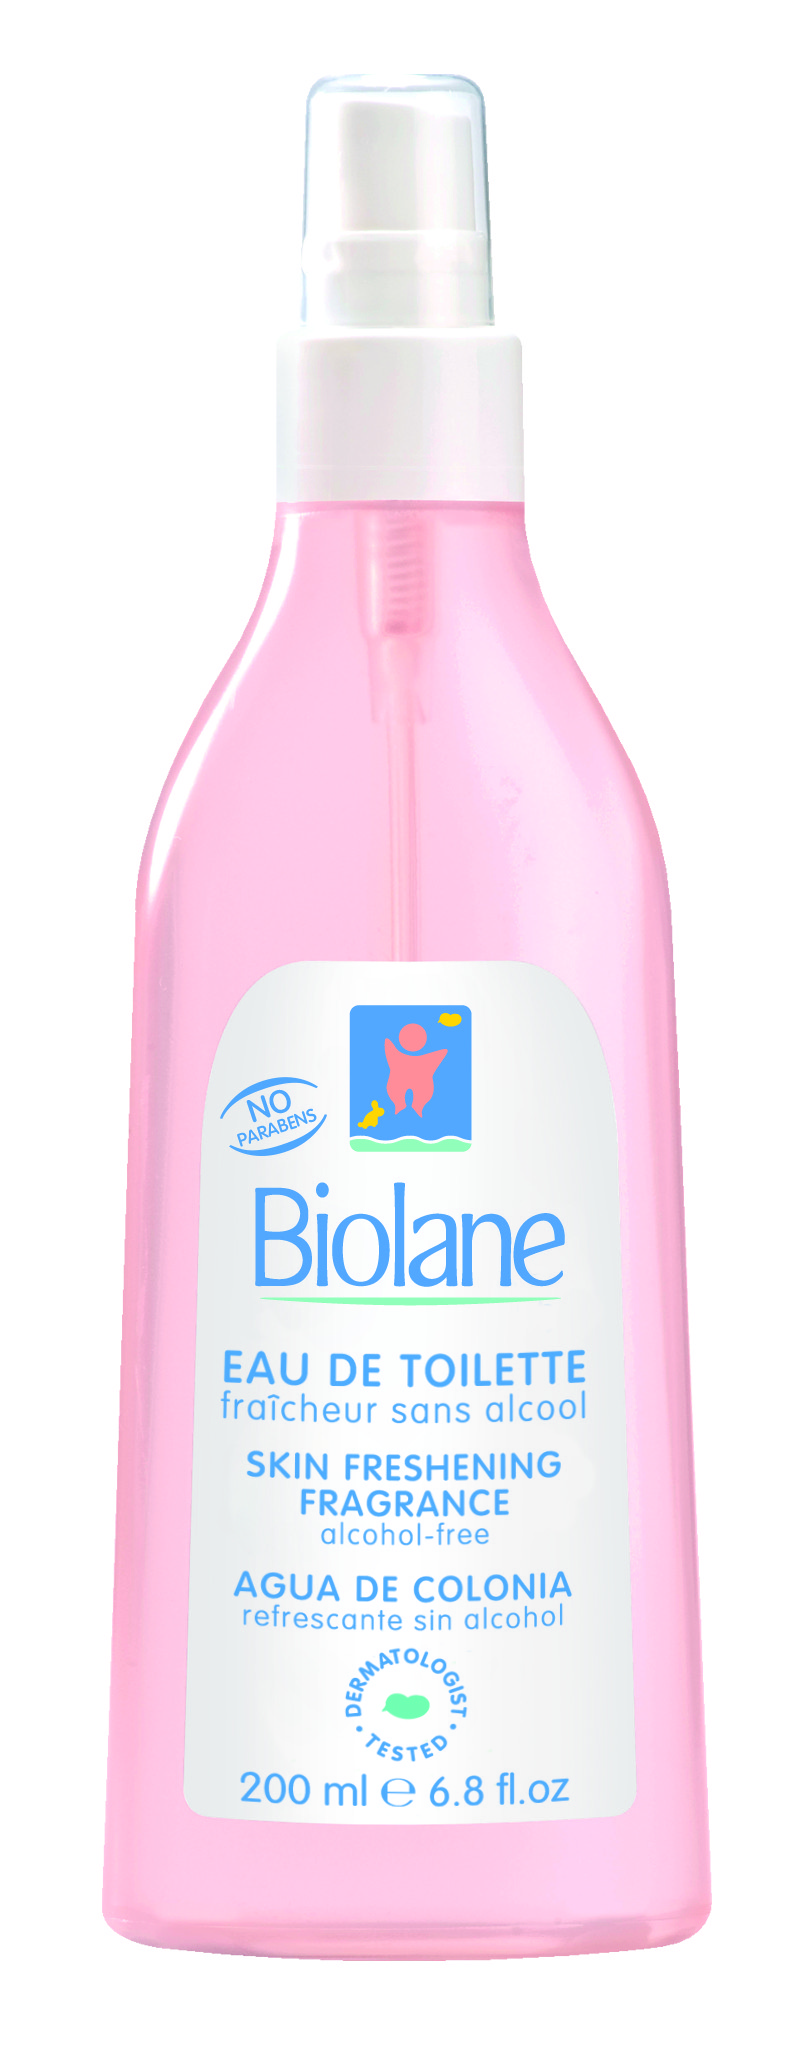 Skin Freshening Fragrance